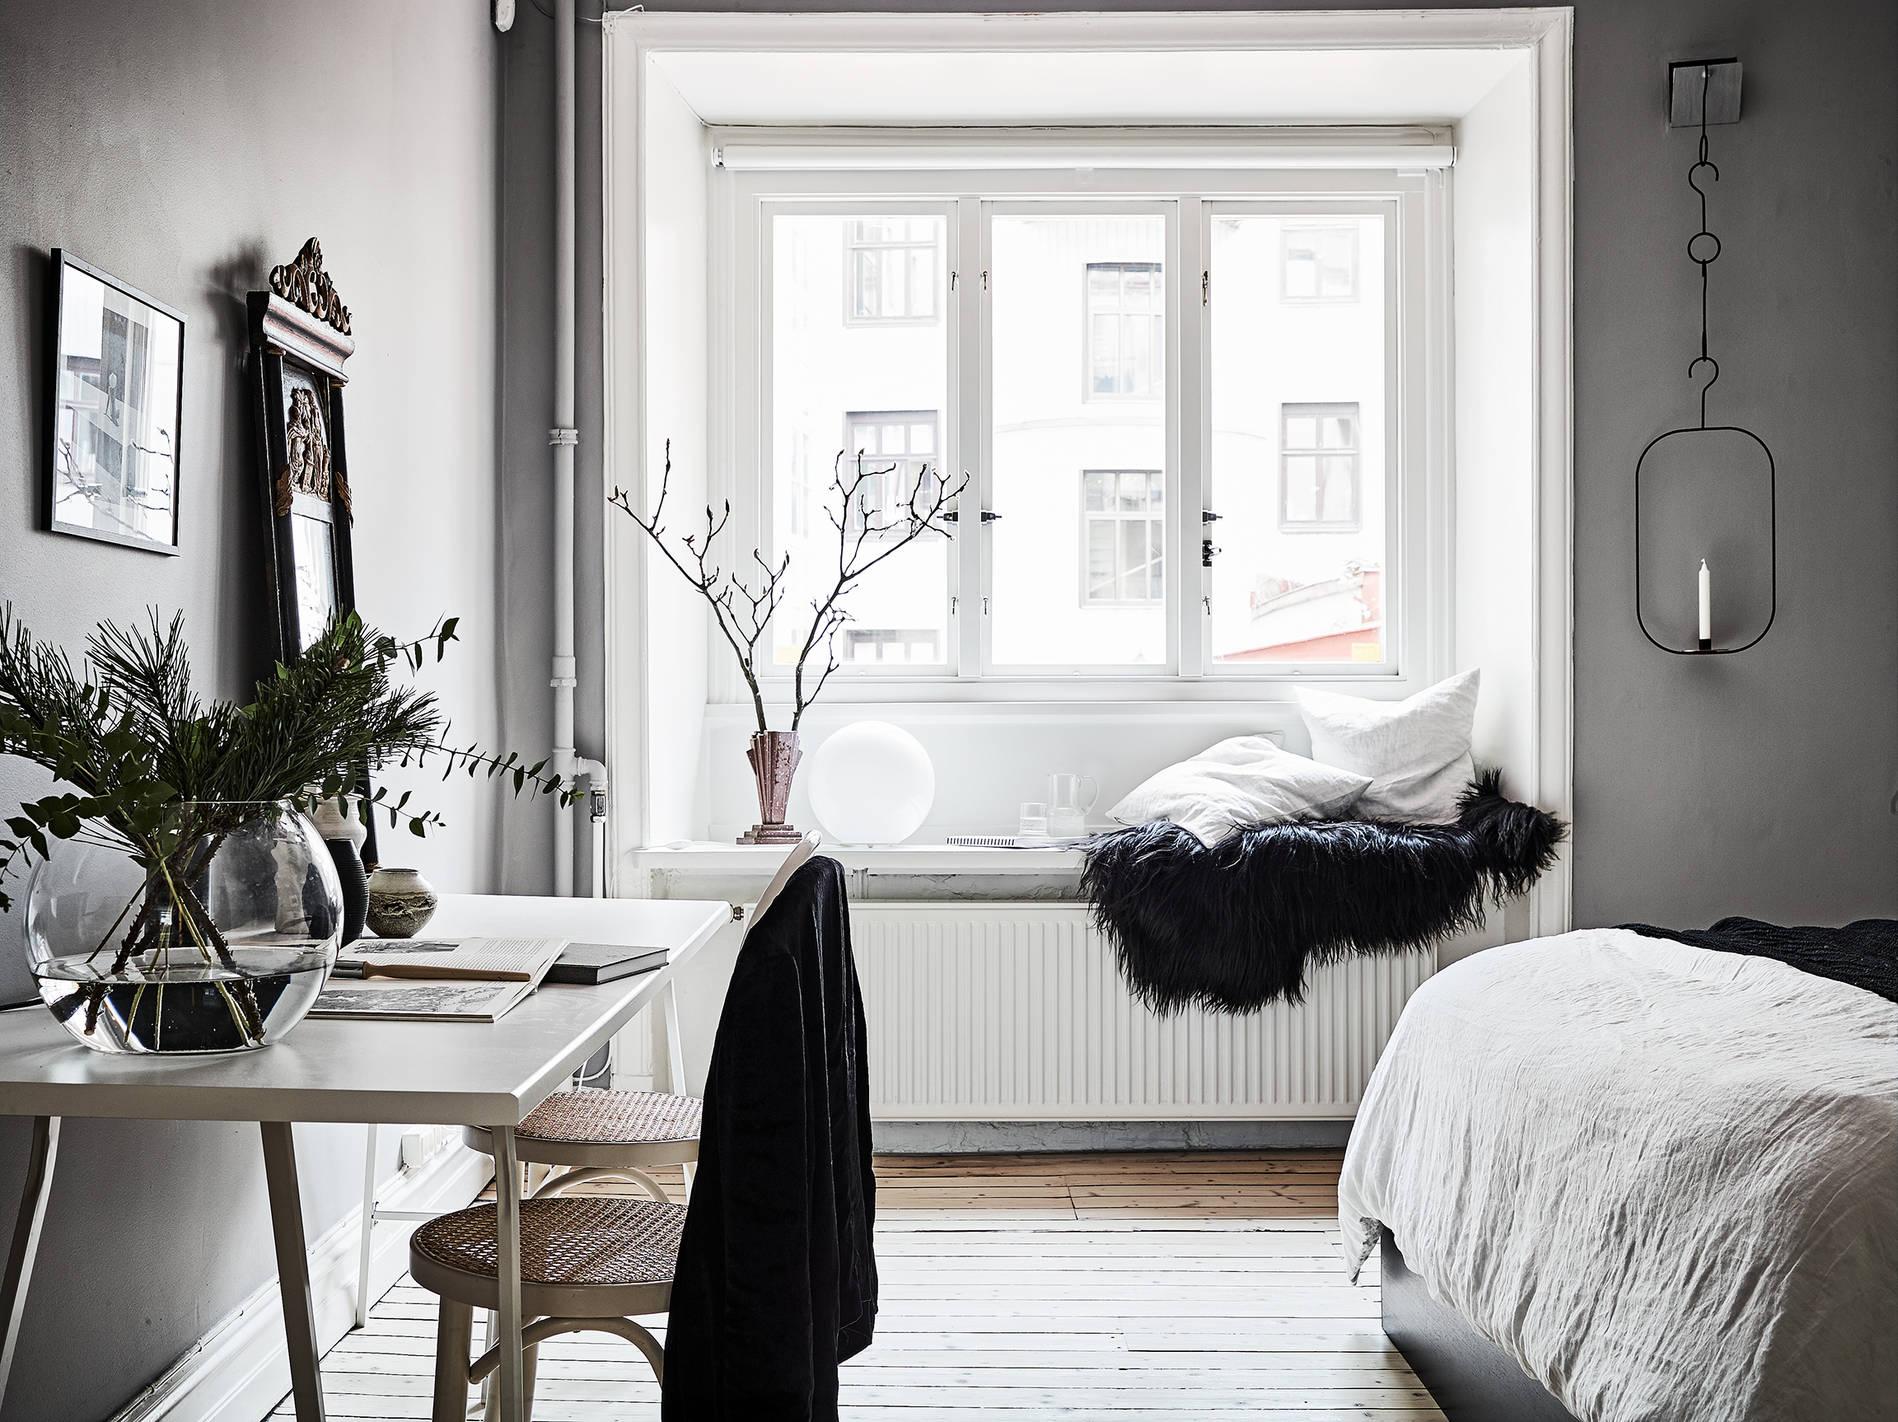 Paredes grises y carpinter a blanca blog tienda for Paredes blancas